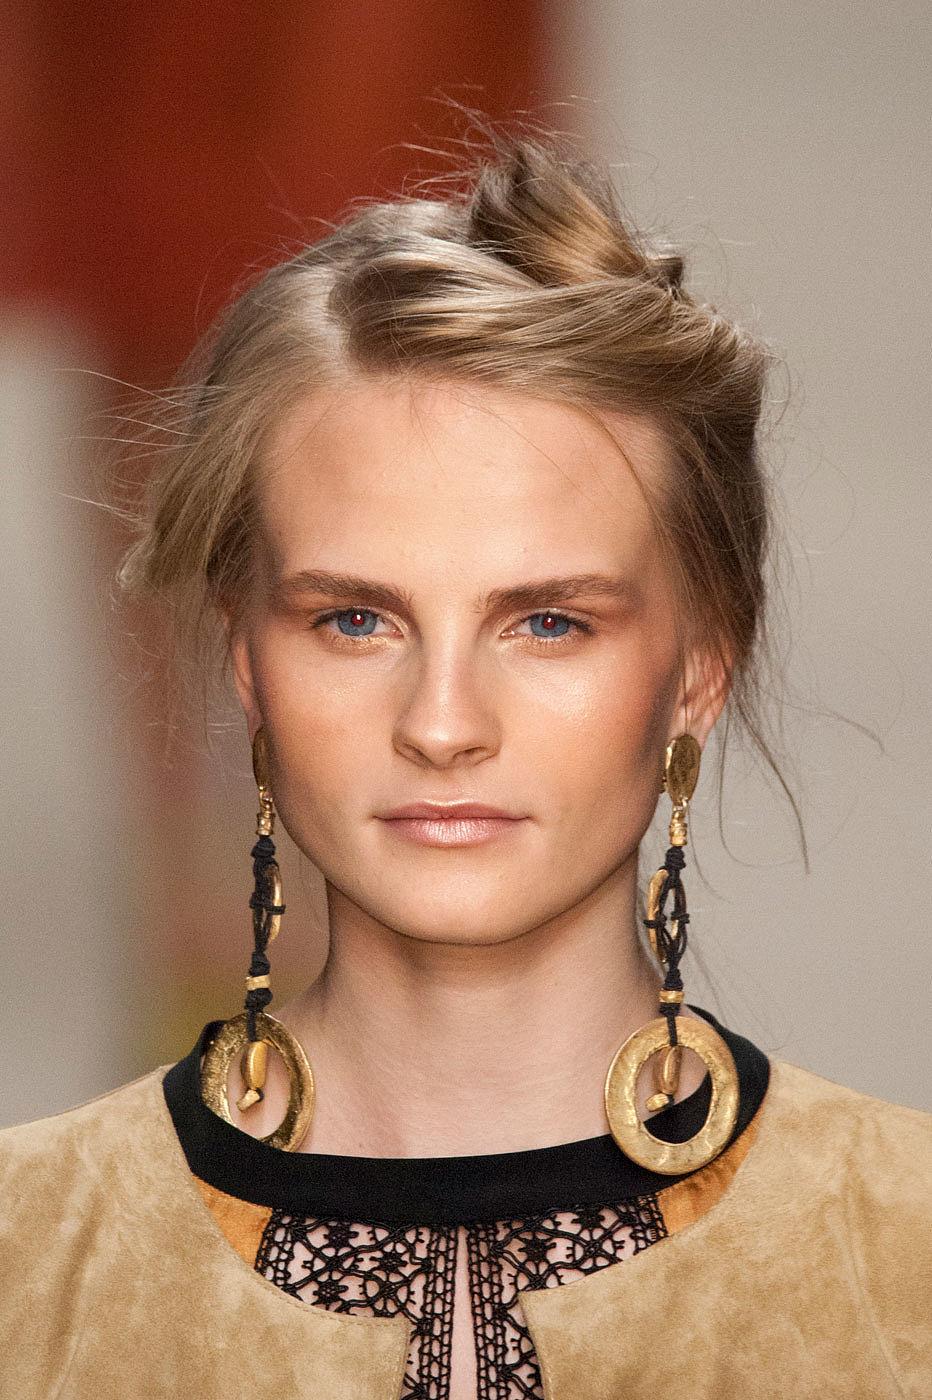 Alberta Ferretti Hairstyles 2016